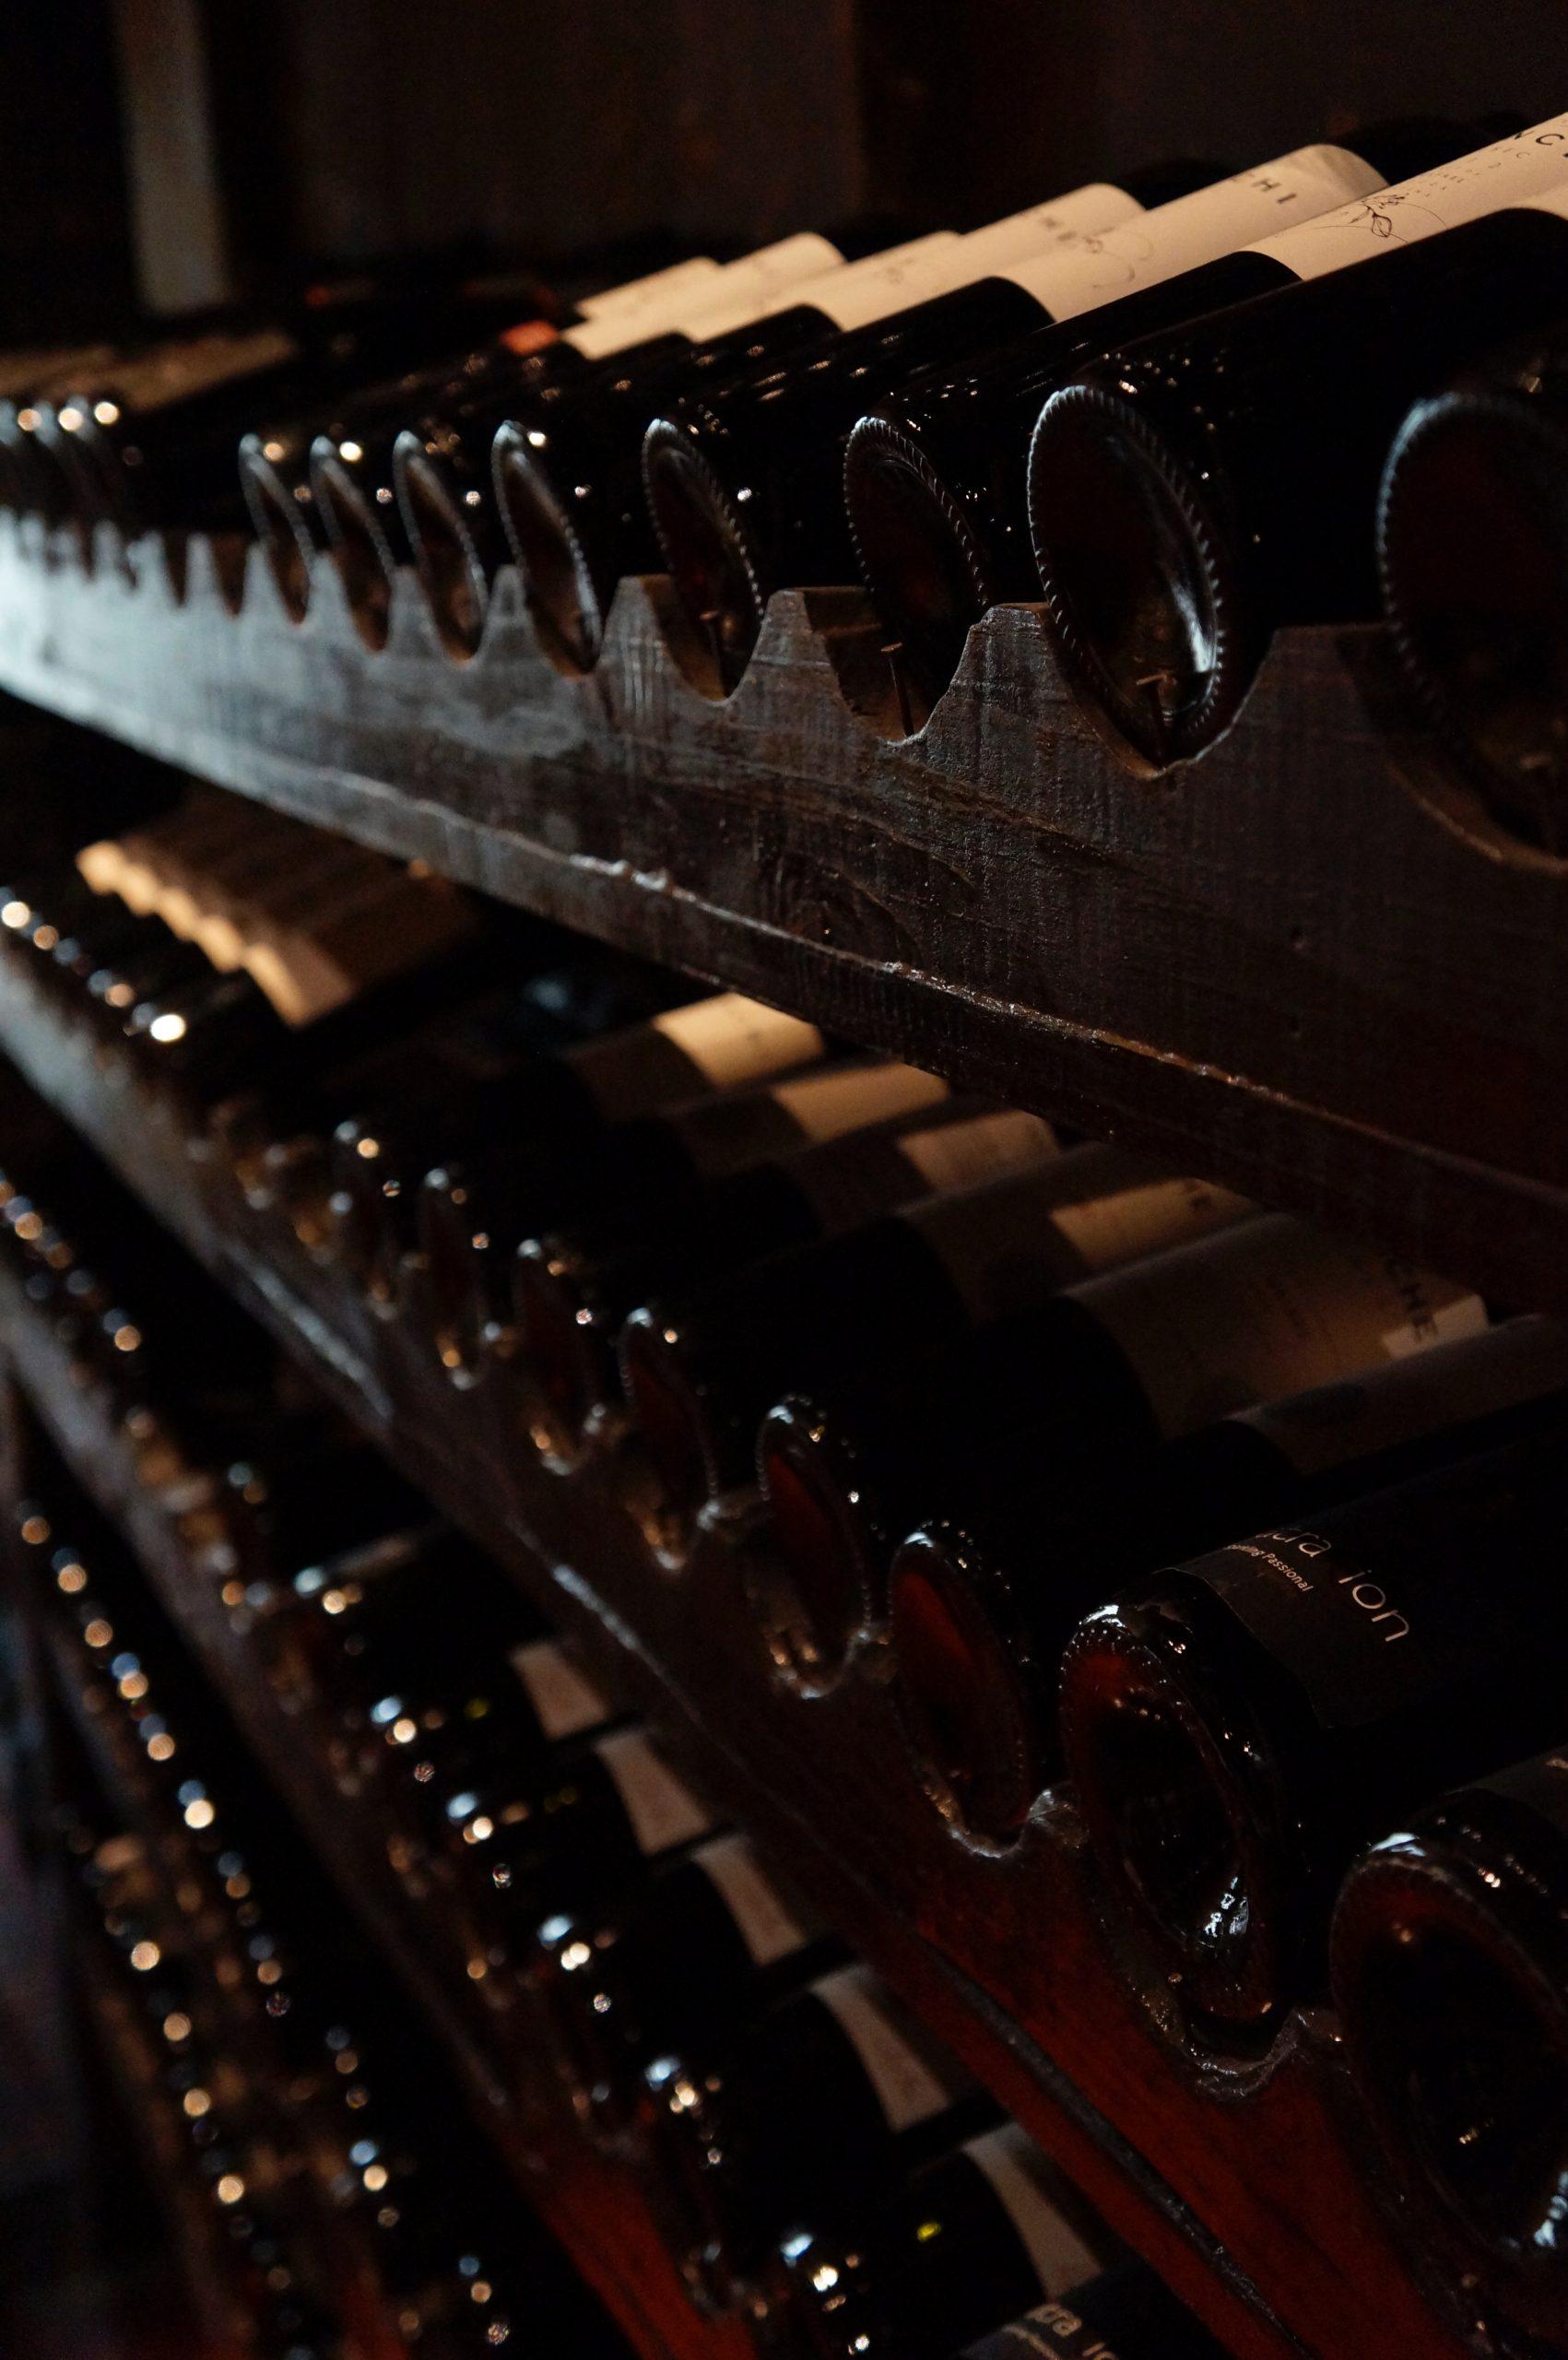 Cellar with Wine Bottle (image courtesy of Bruno Cantuaria)